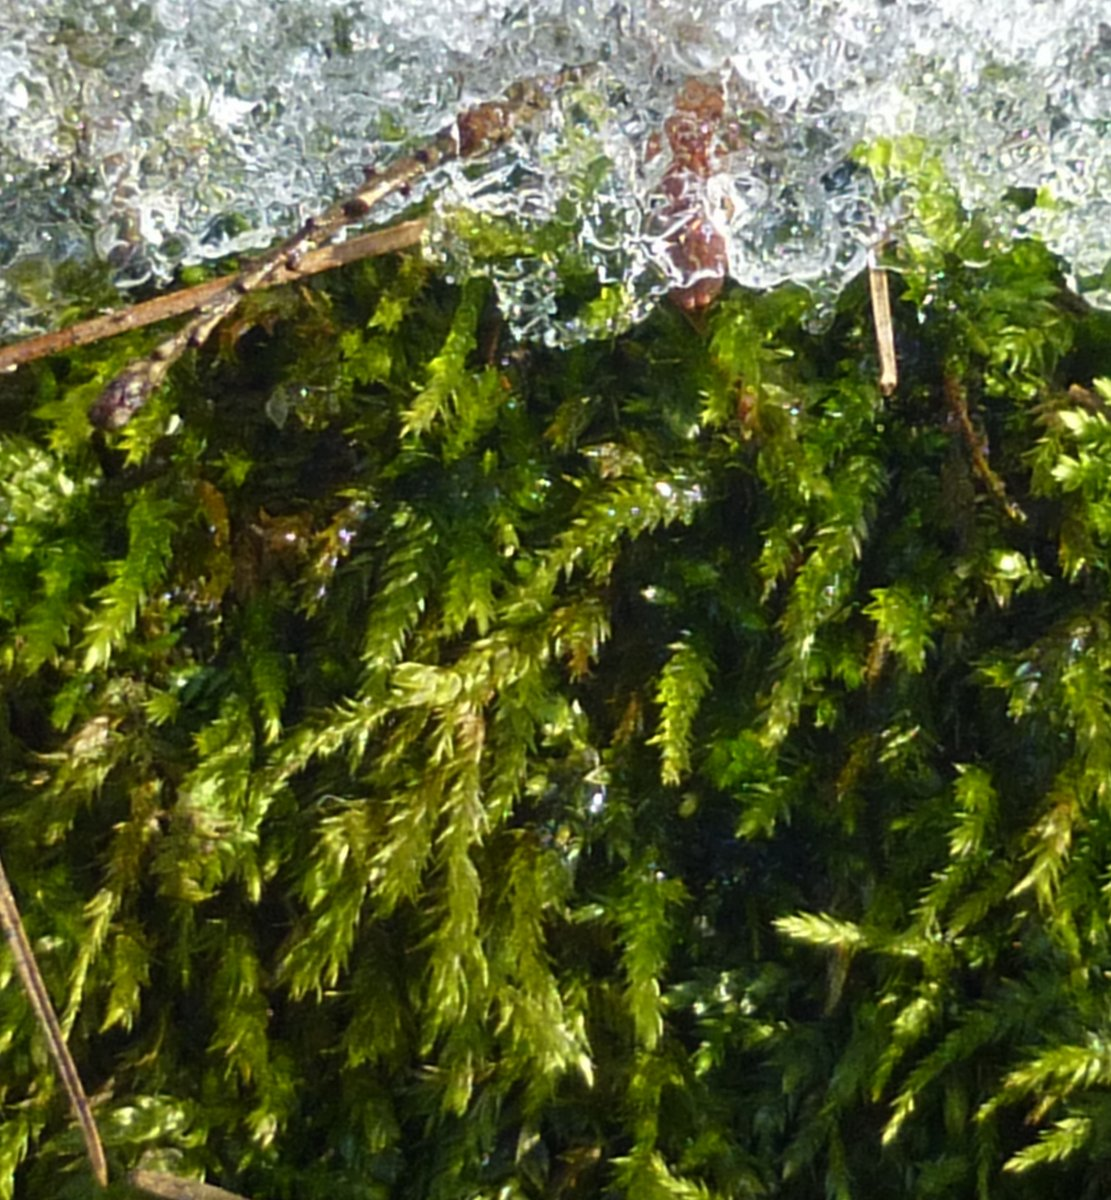 8. Moss-Possibly Hedwigia cillata